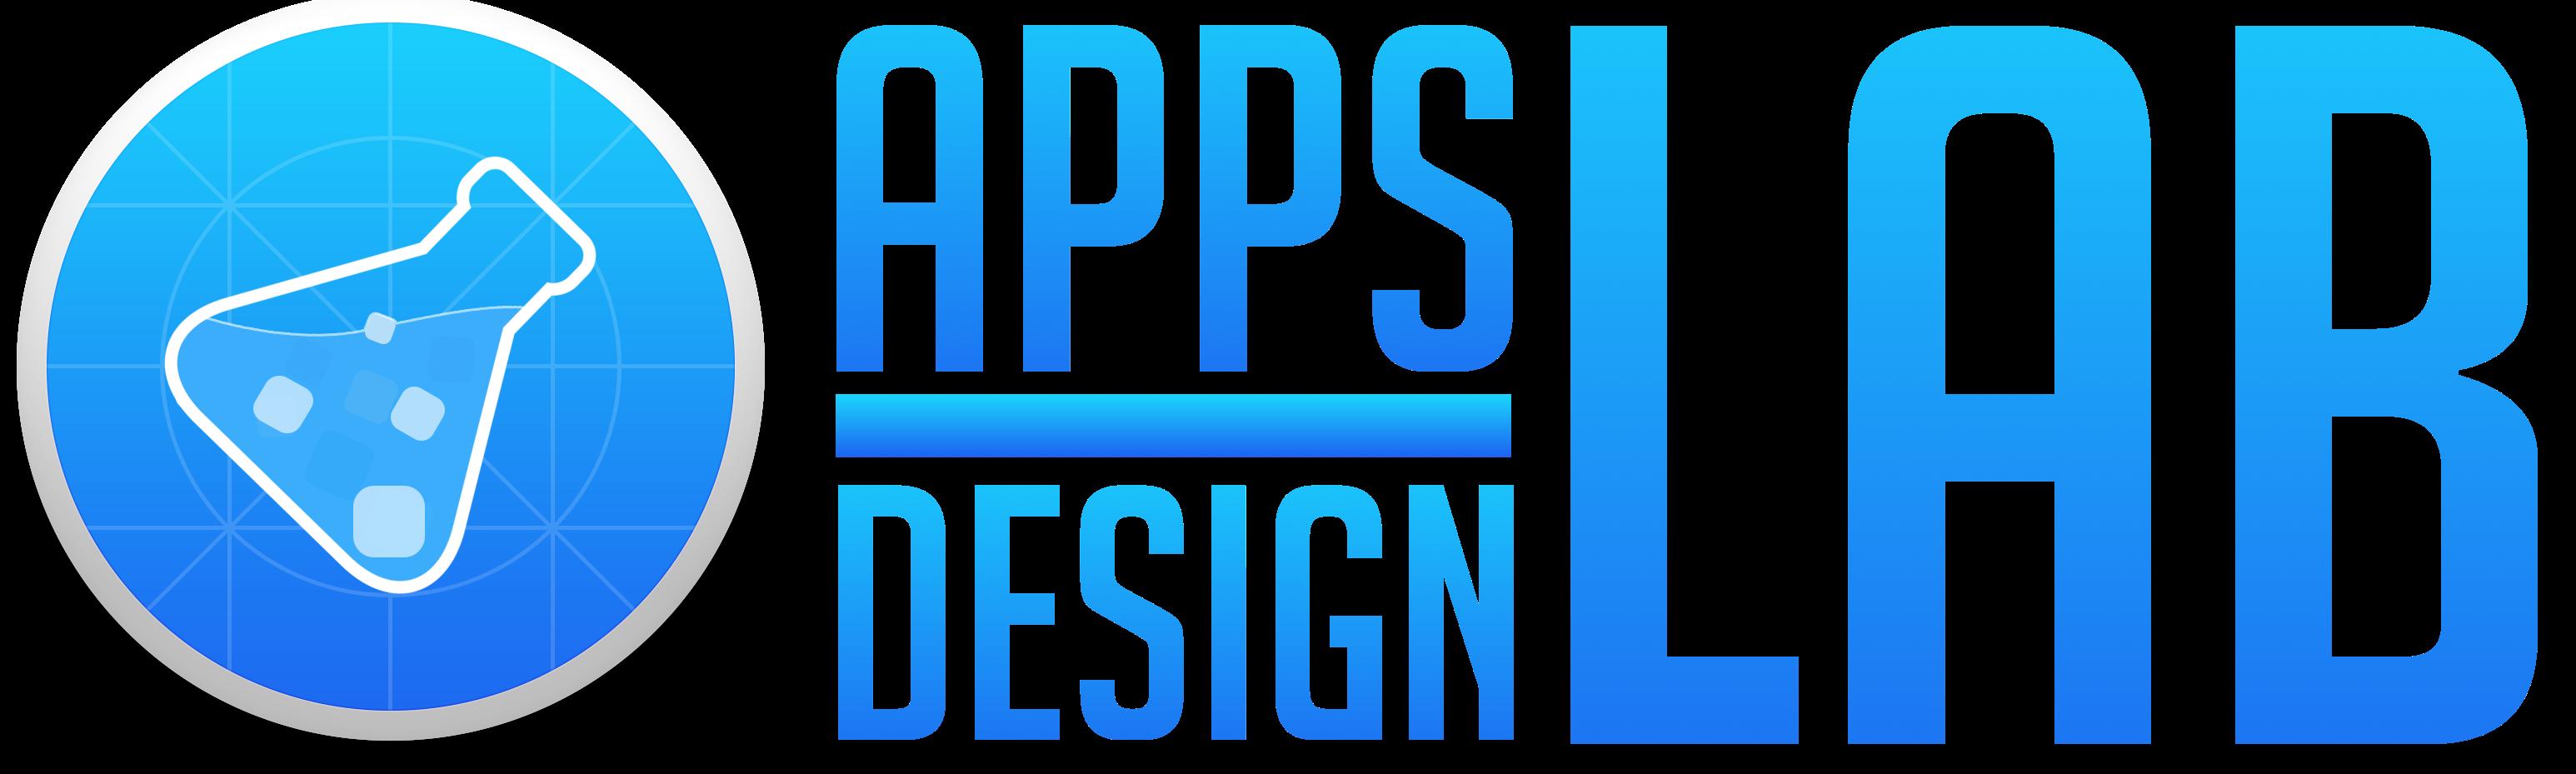 AppsDesignLab App & Website Creation